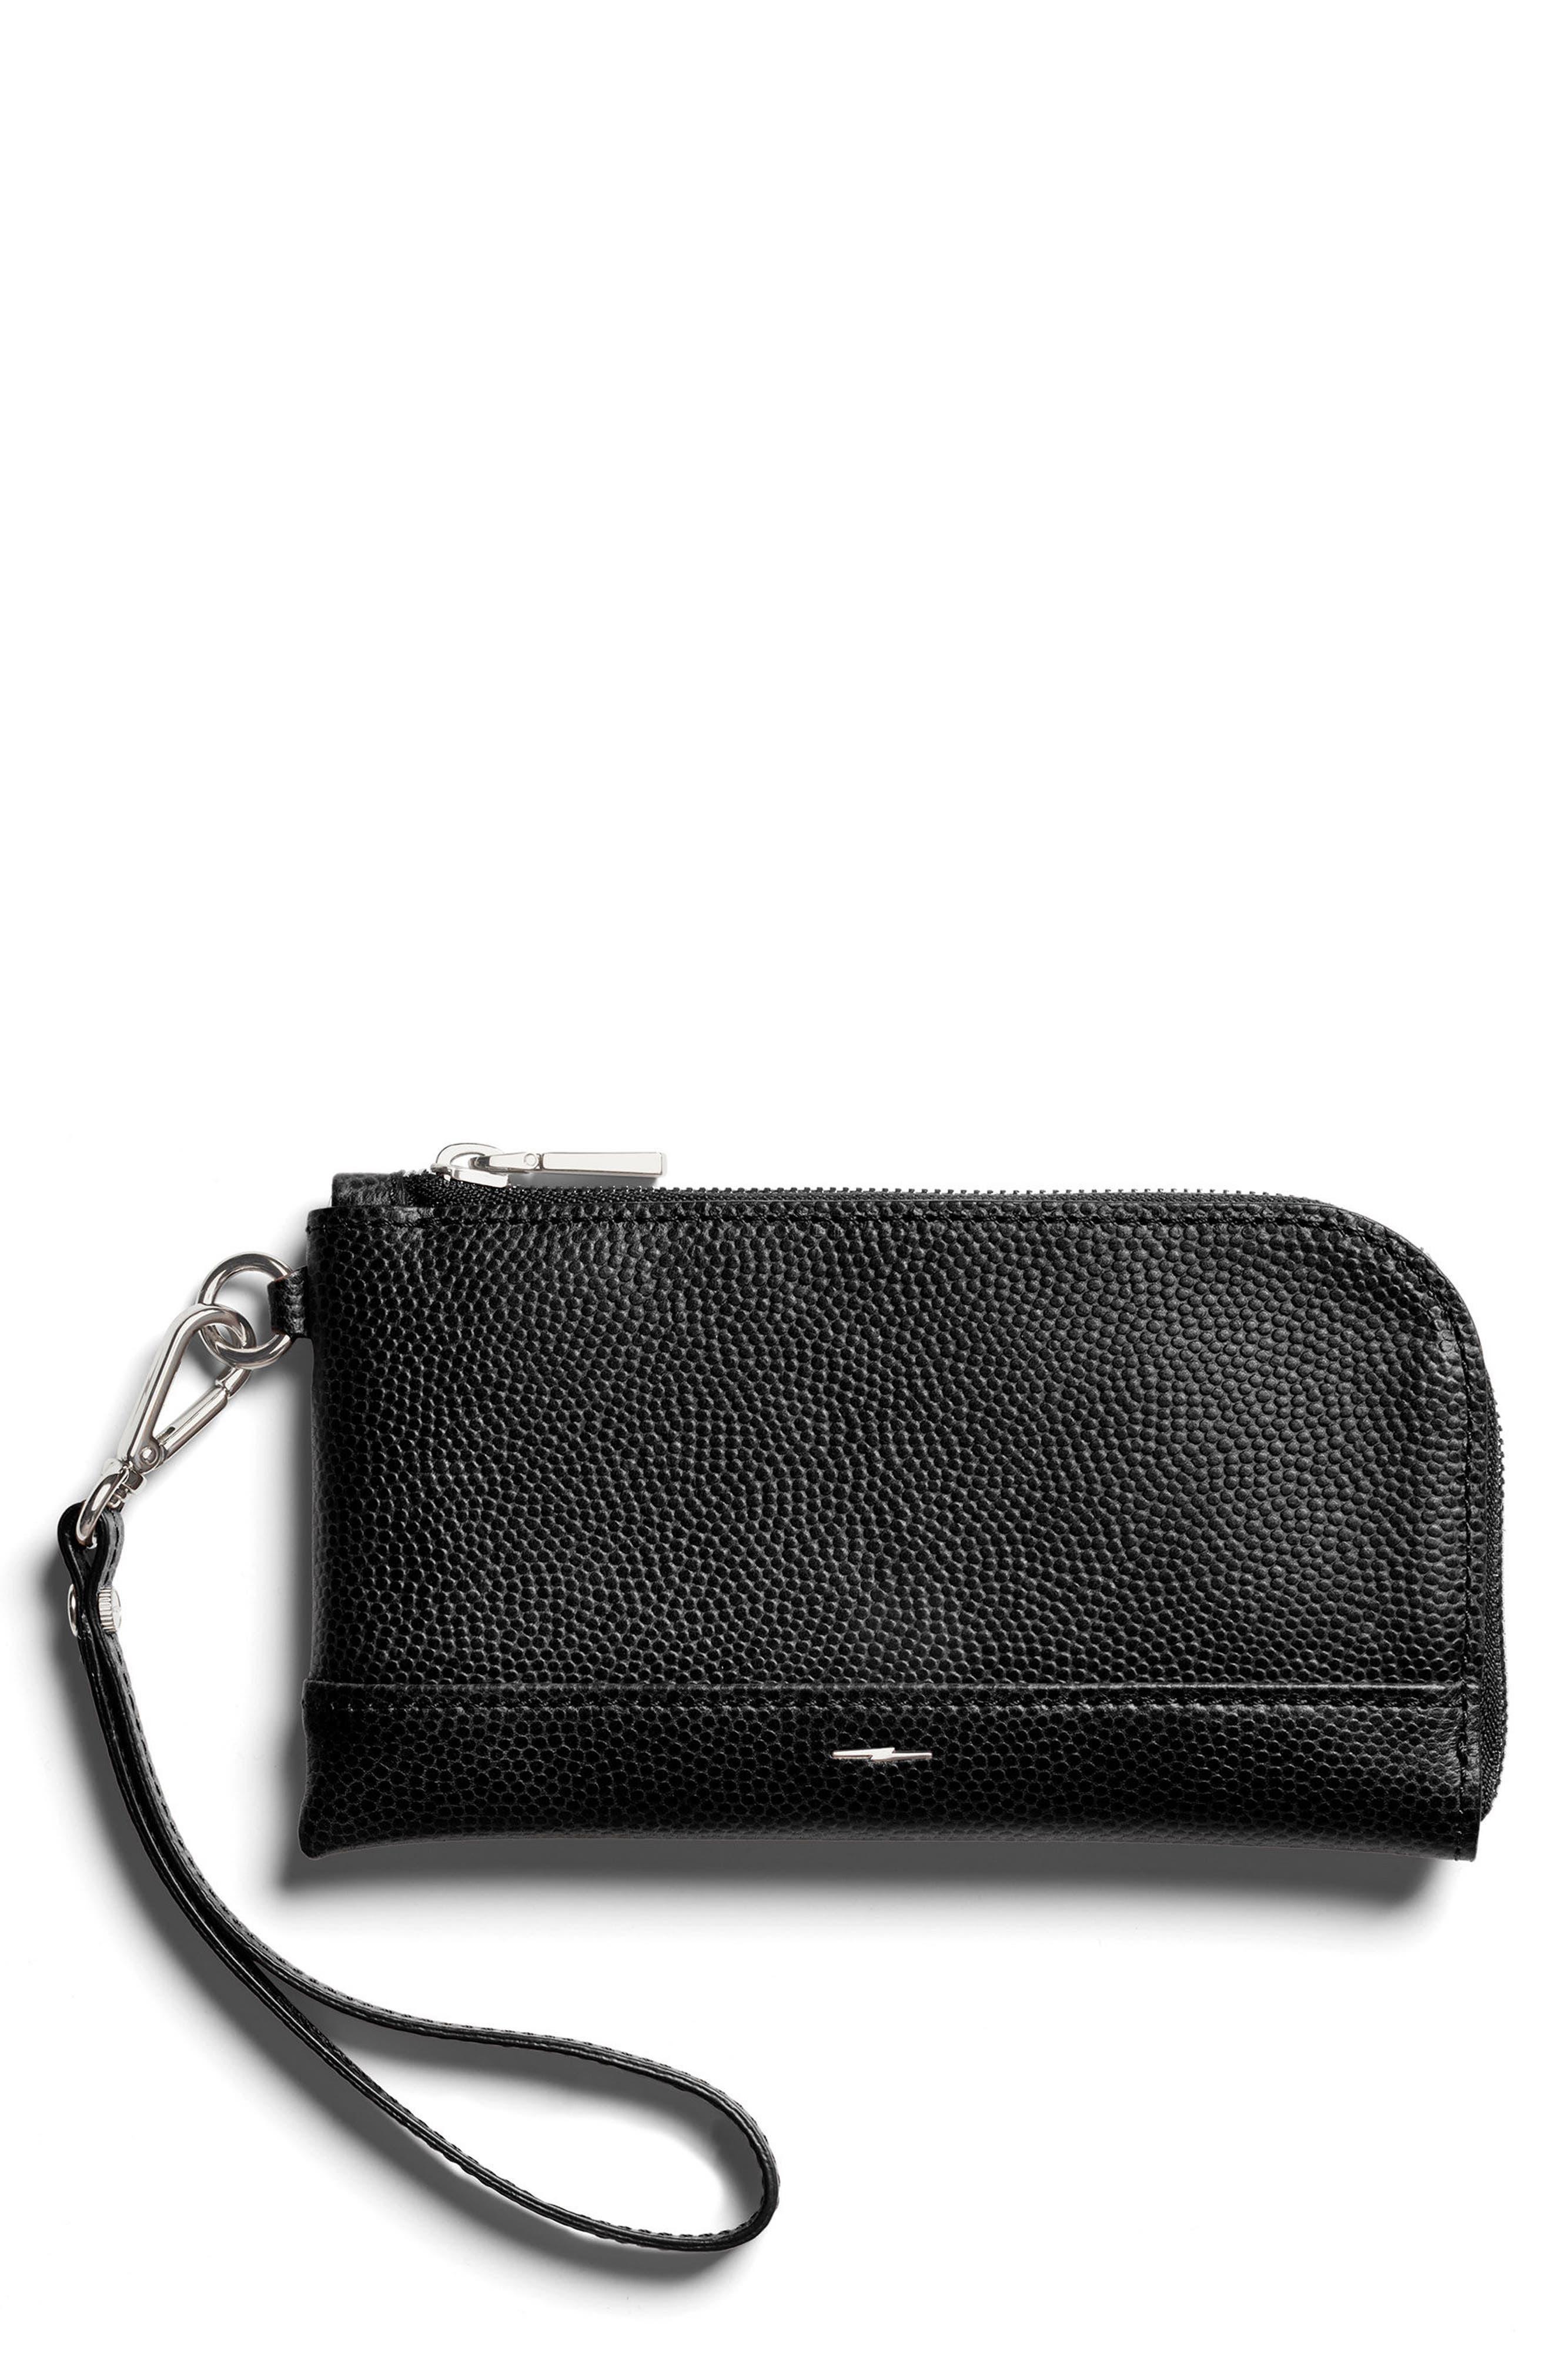 Shinola Latigo Leather Wristlet